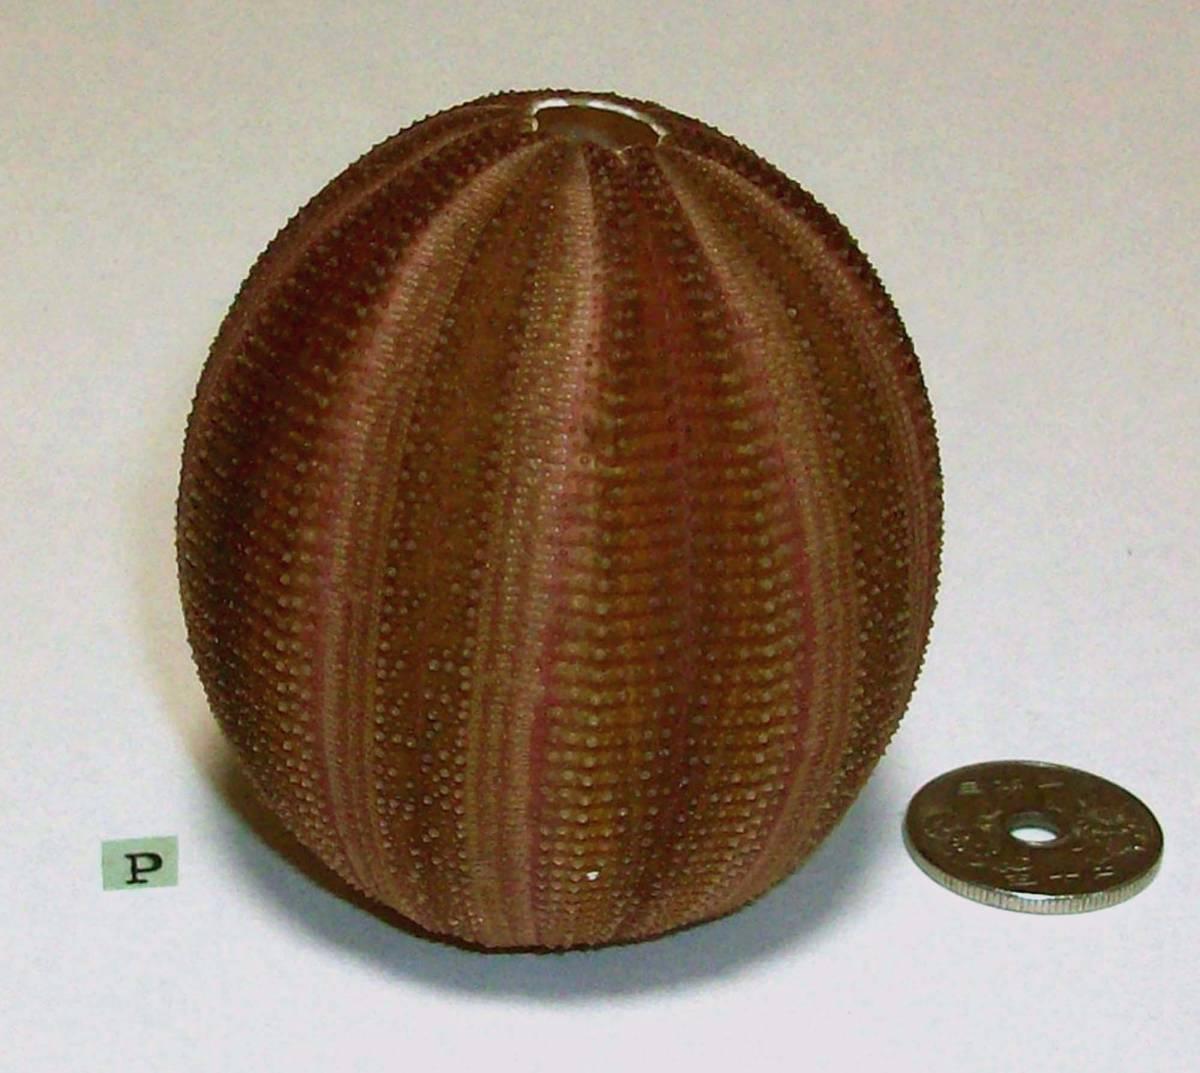 ☆☆☆ P ウニの殻 ウニ殻 高さ6.1cm位 オーストラリア 検 インテリア 骨格標本 カシパン 貝殻 貝_画像2